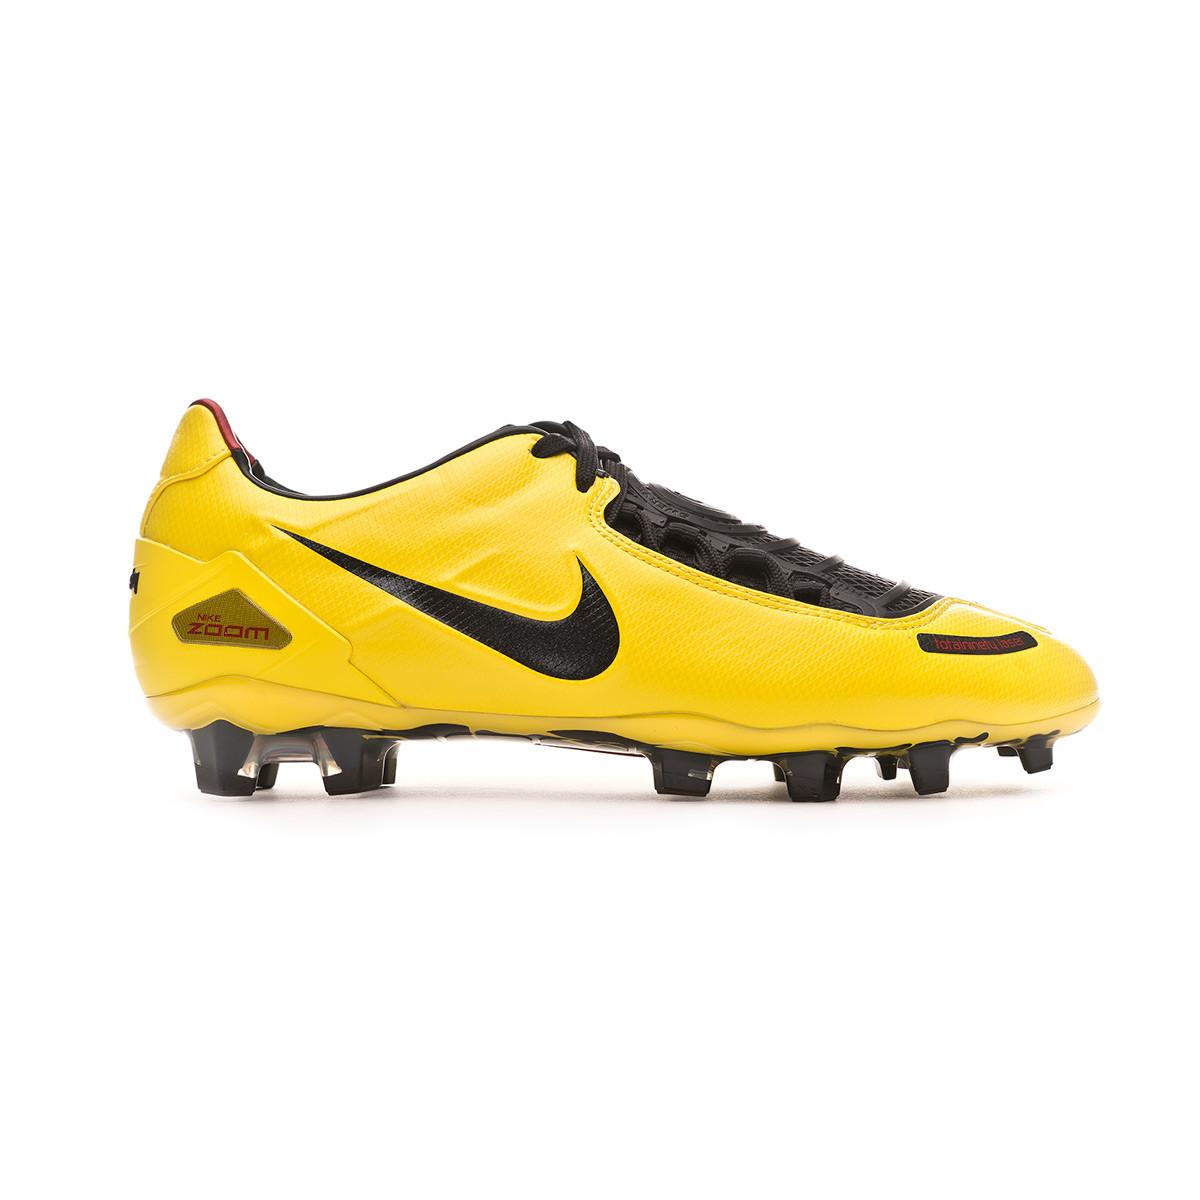 Nike Total 90 Laser SE FG Football Boots